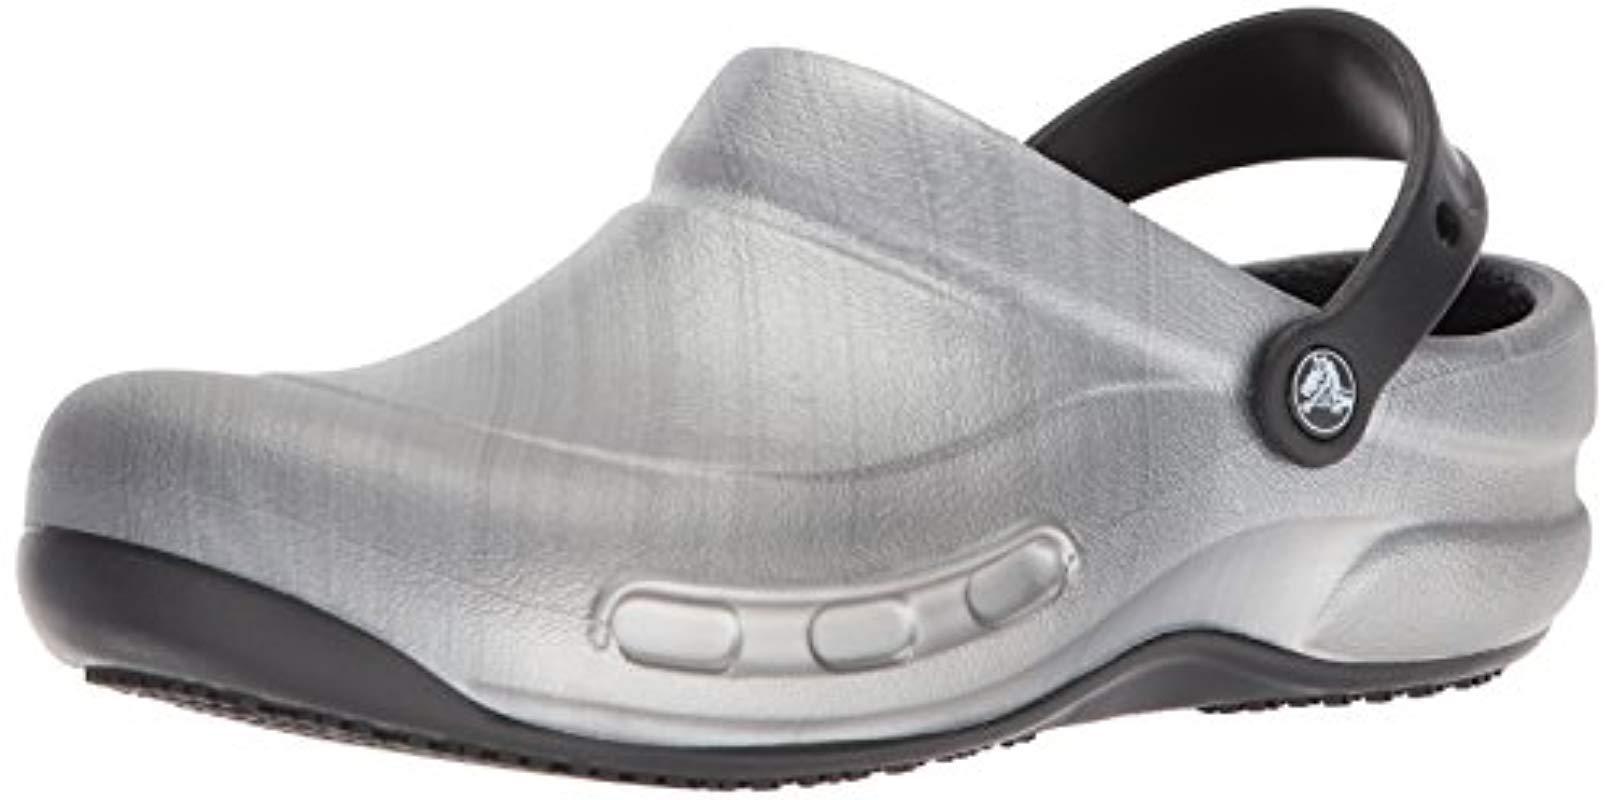 847153593bfa4 Crocs™ - Metallic And Bistro Graphic Clog